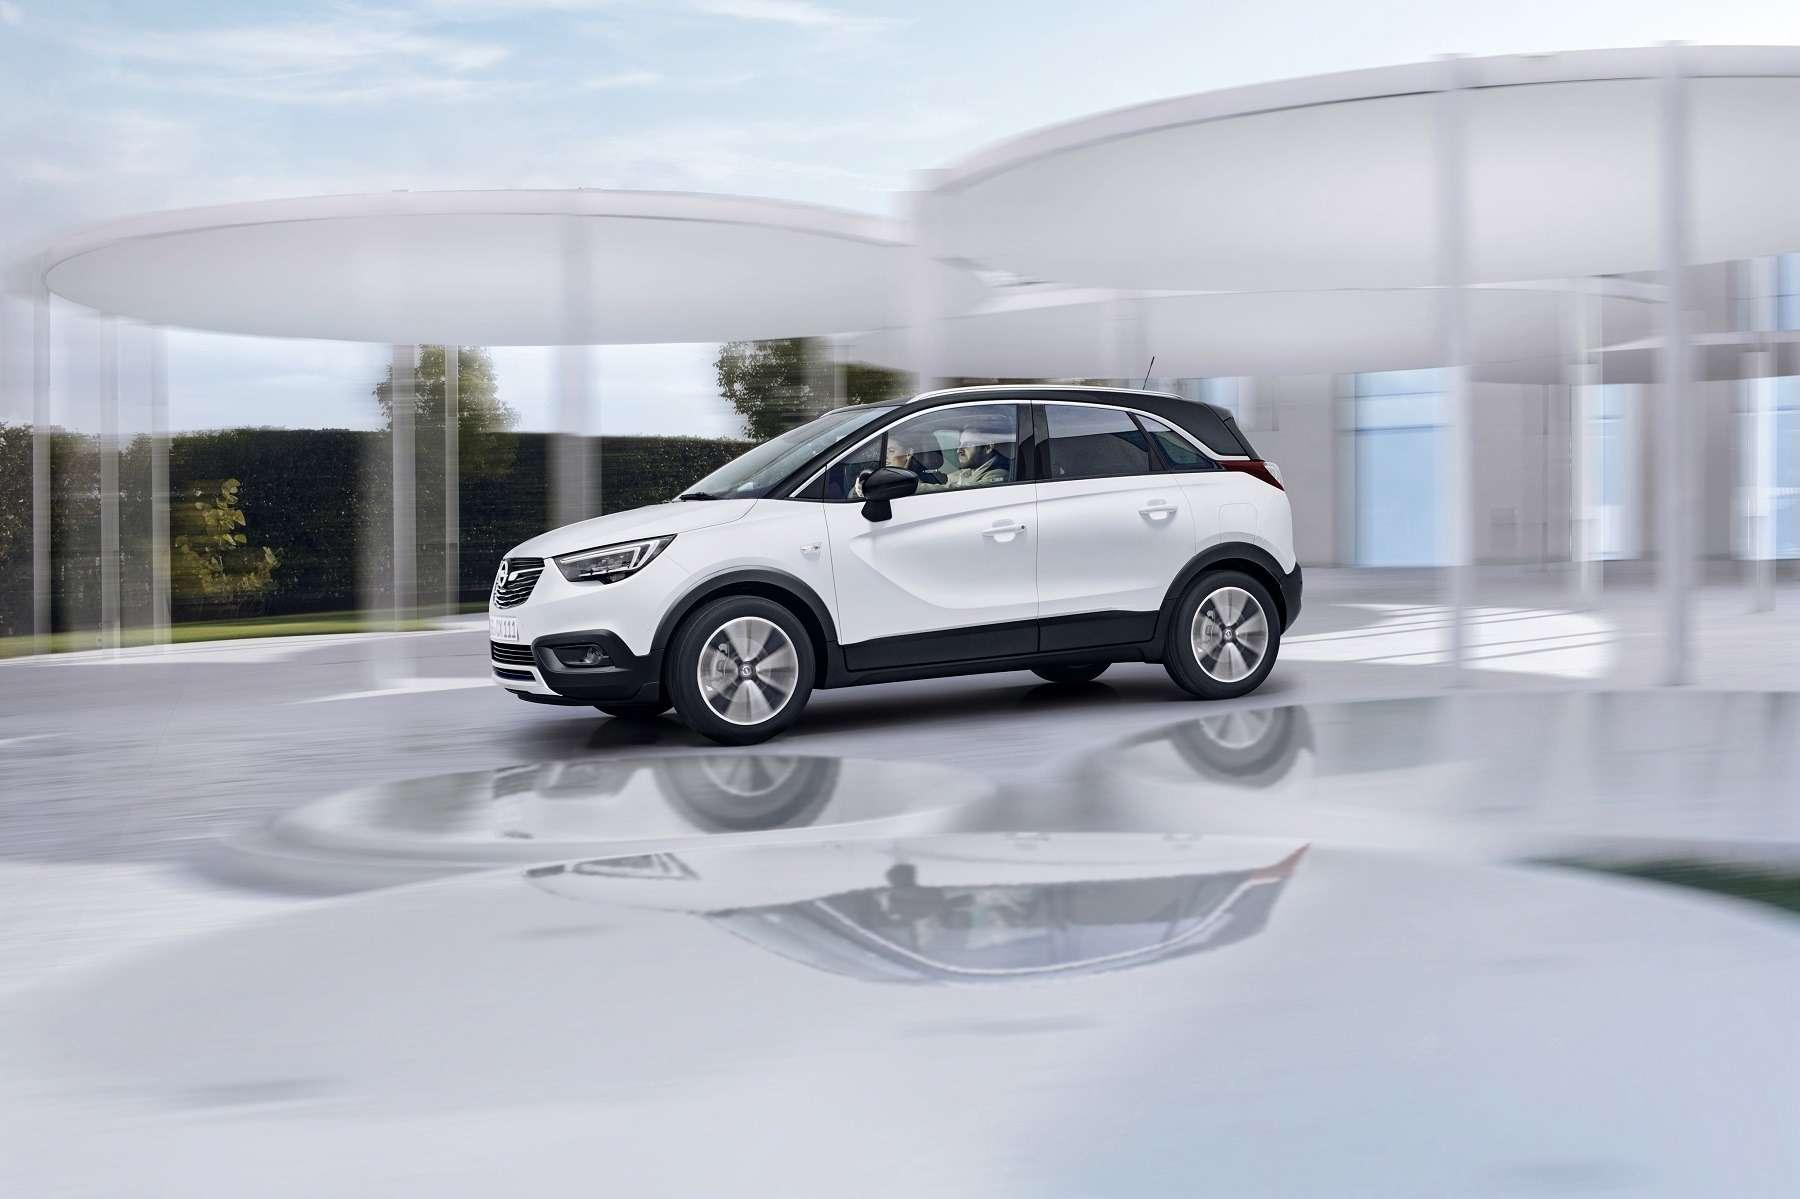 Кроссовер Opel Crossland Xпредставлен официально— фото 694500